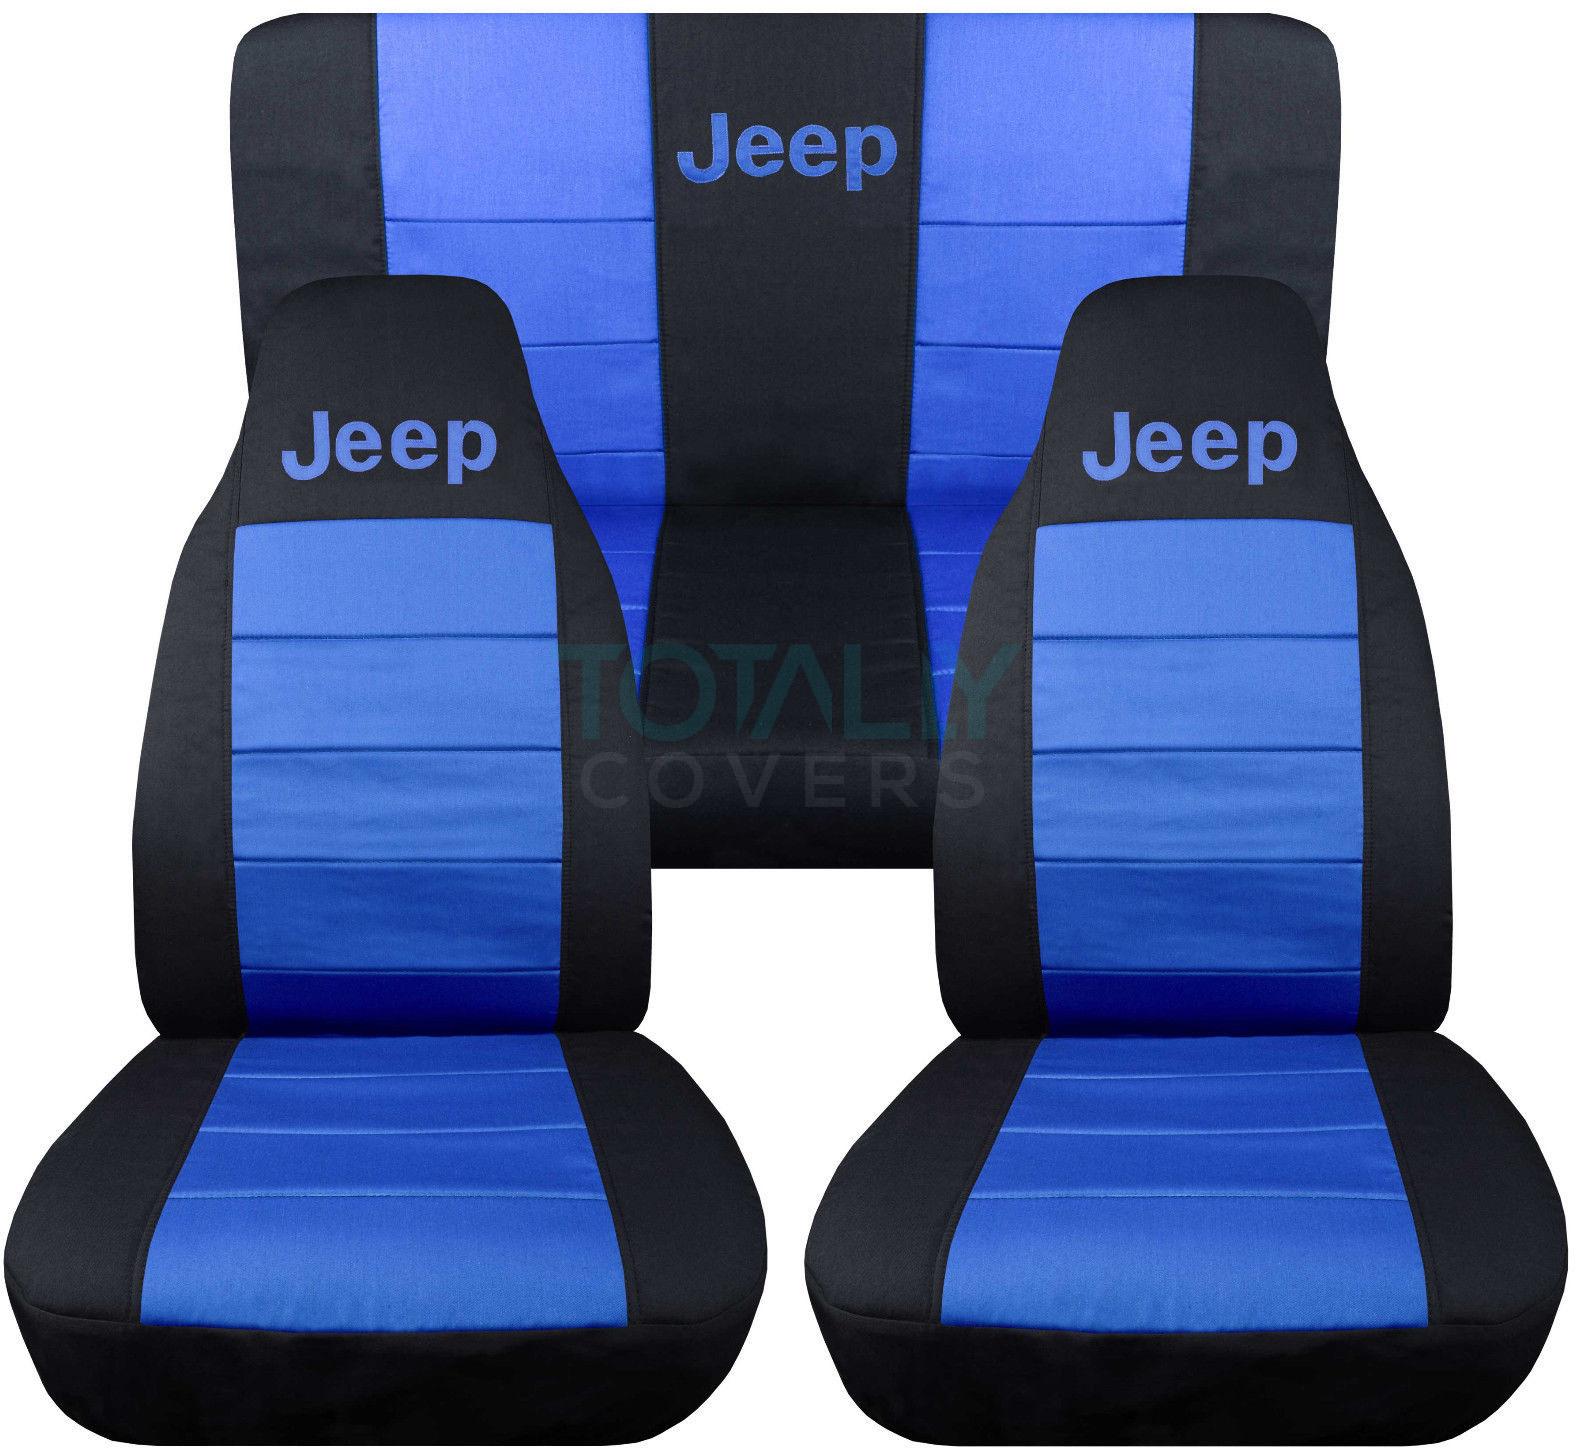 jk installed for neoprene cover set jeep black tj unlimited seat covers wrangler